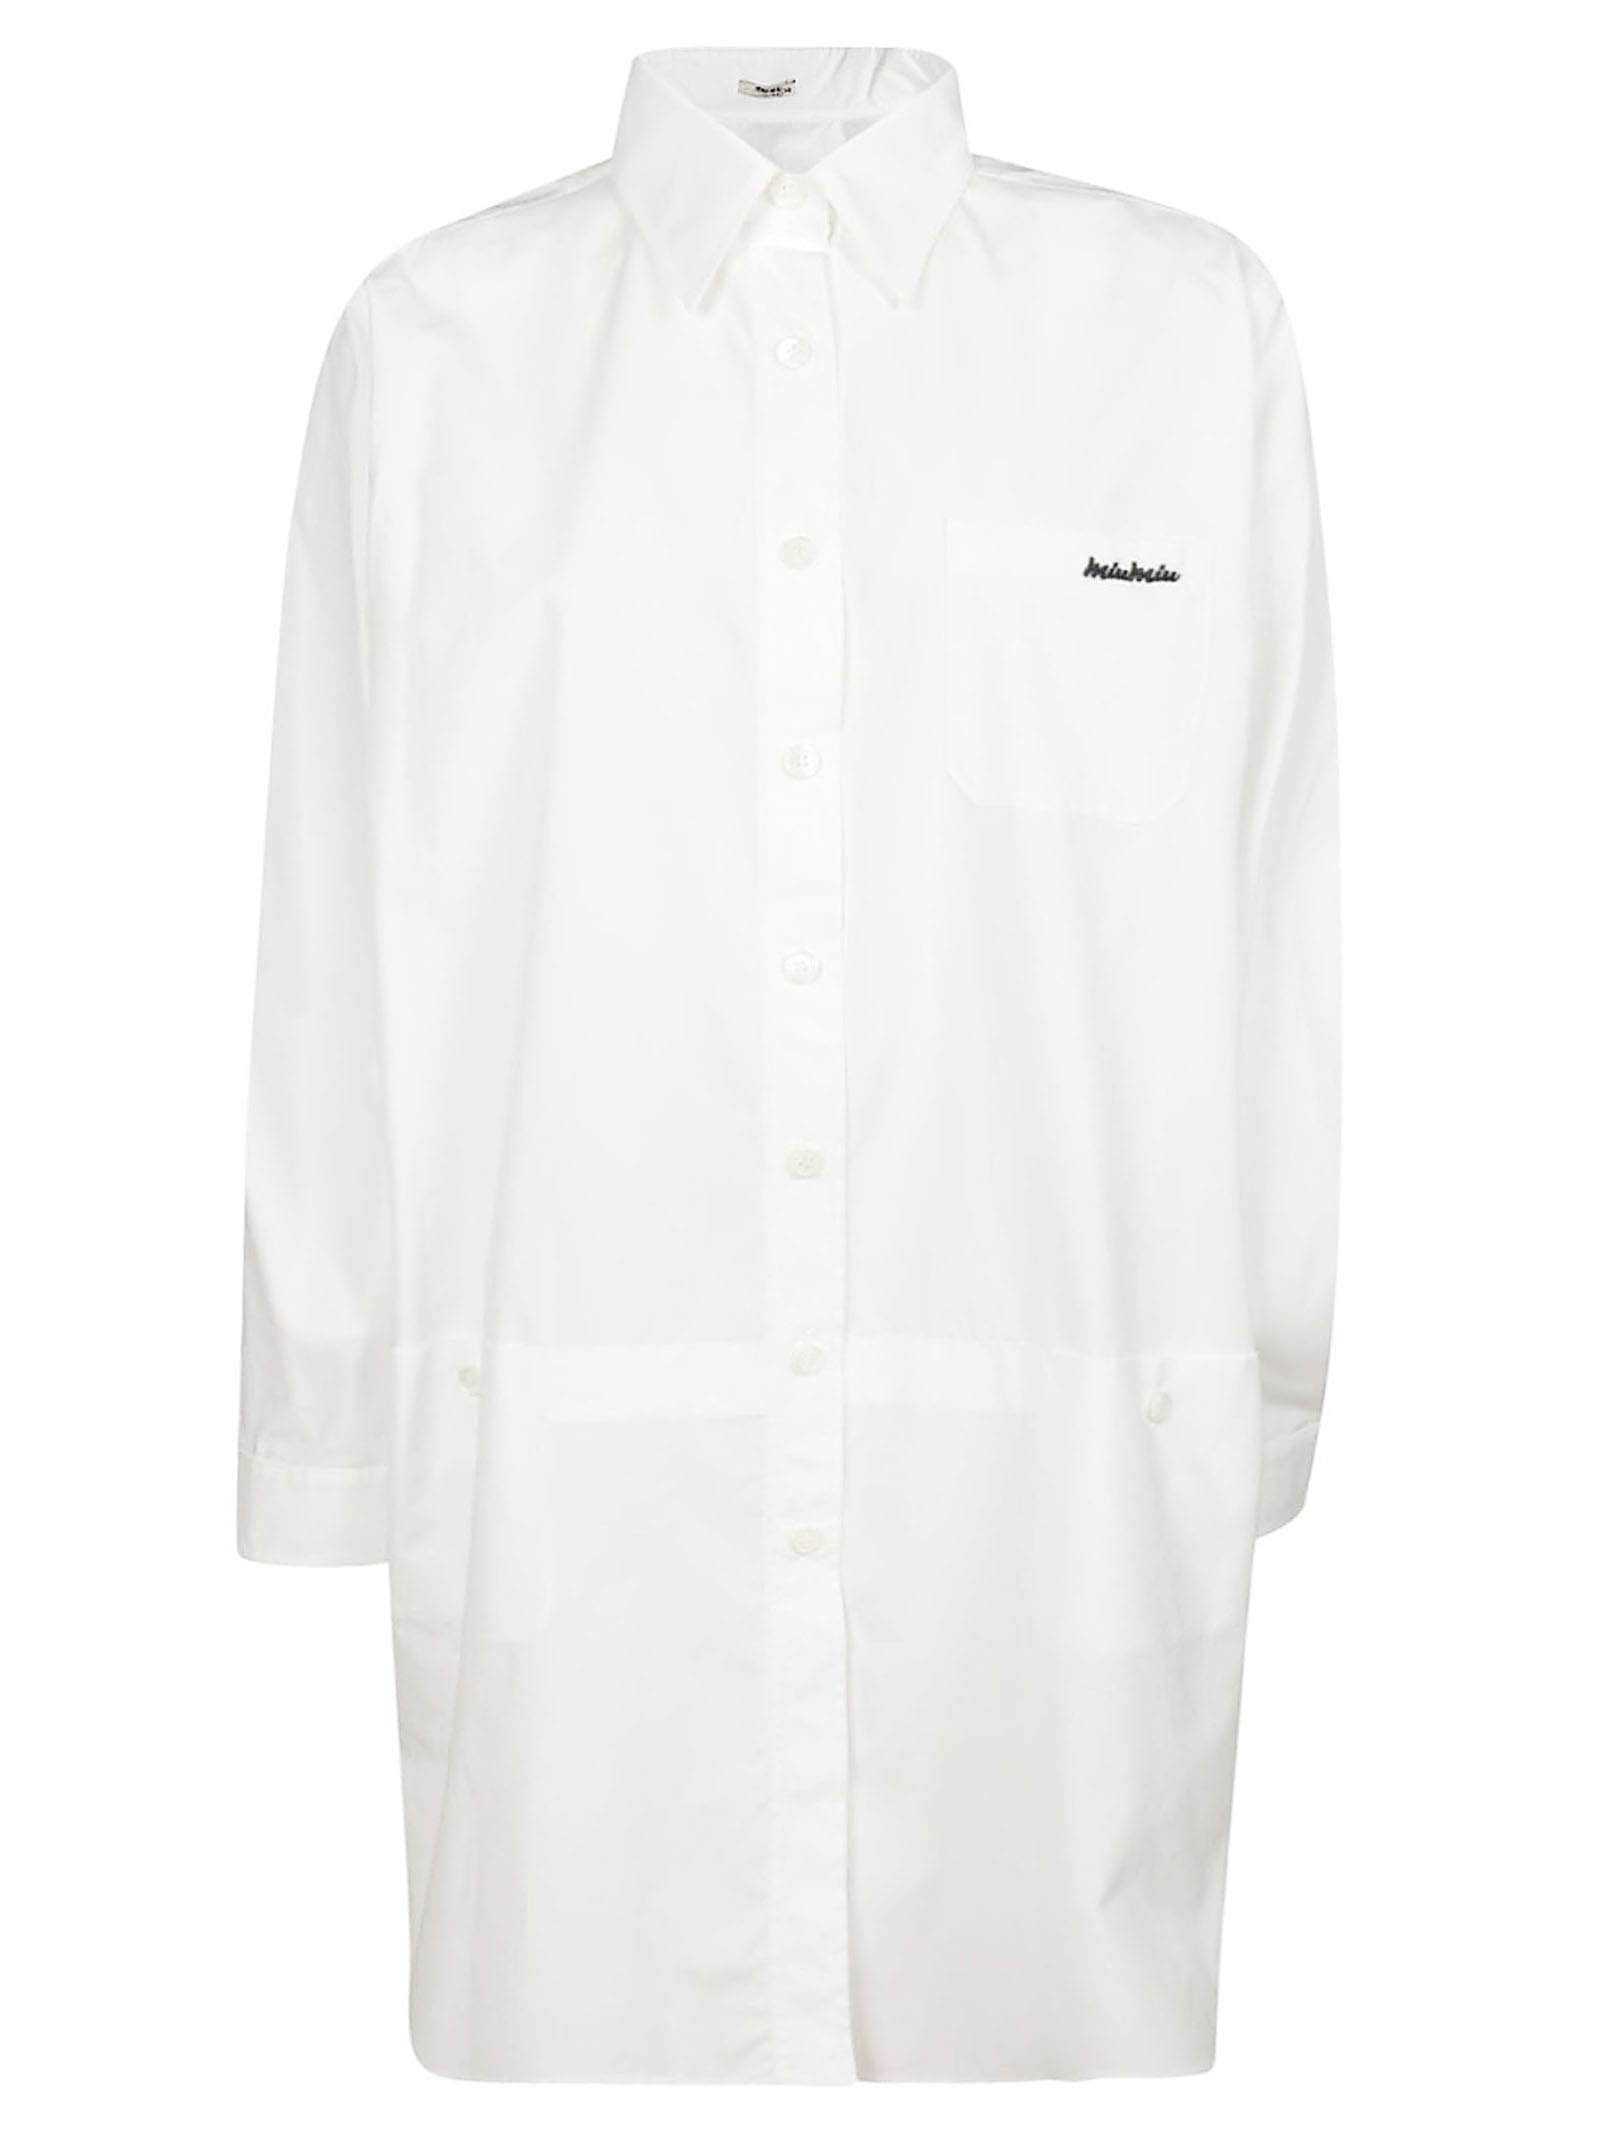 Miu Miu Buttoned Dress